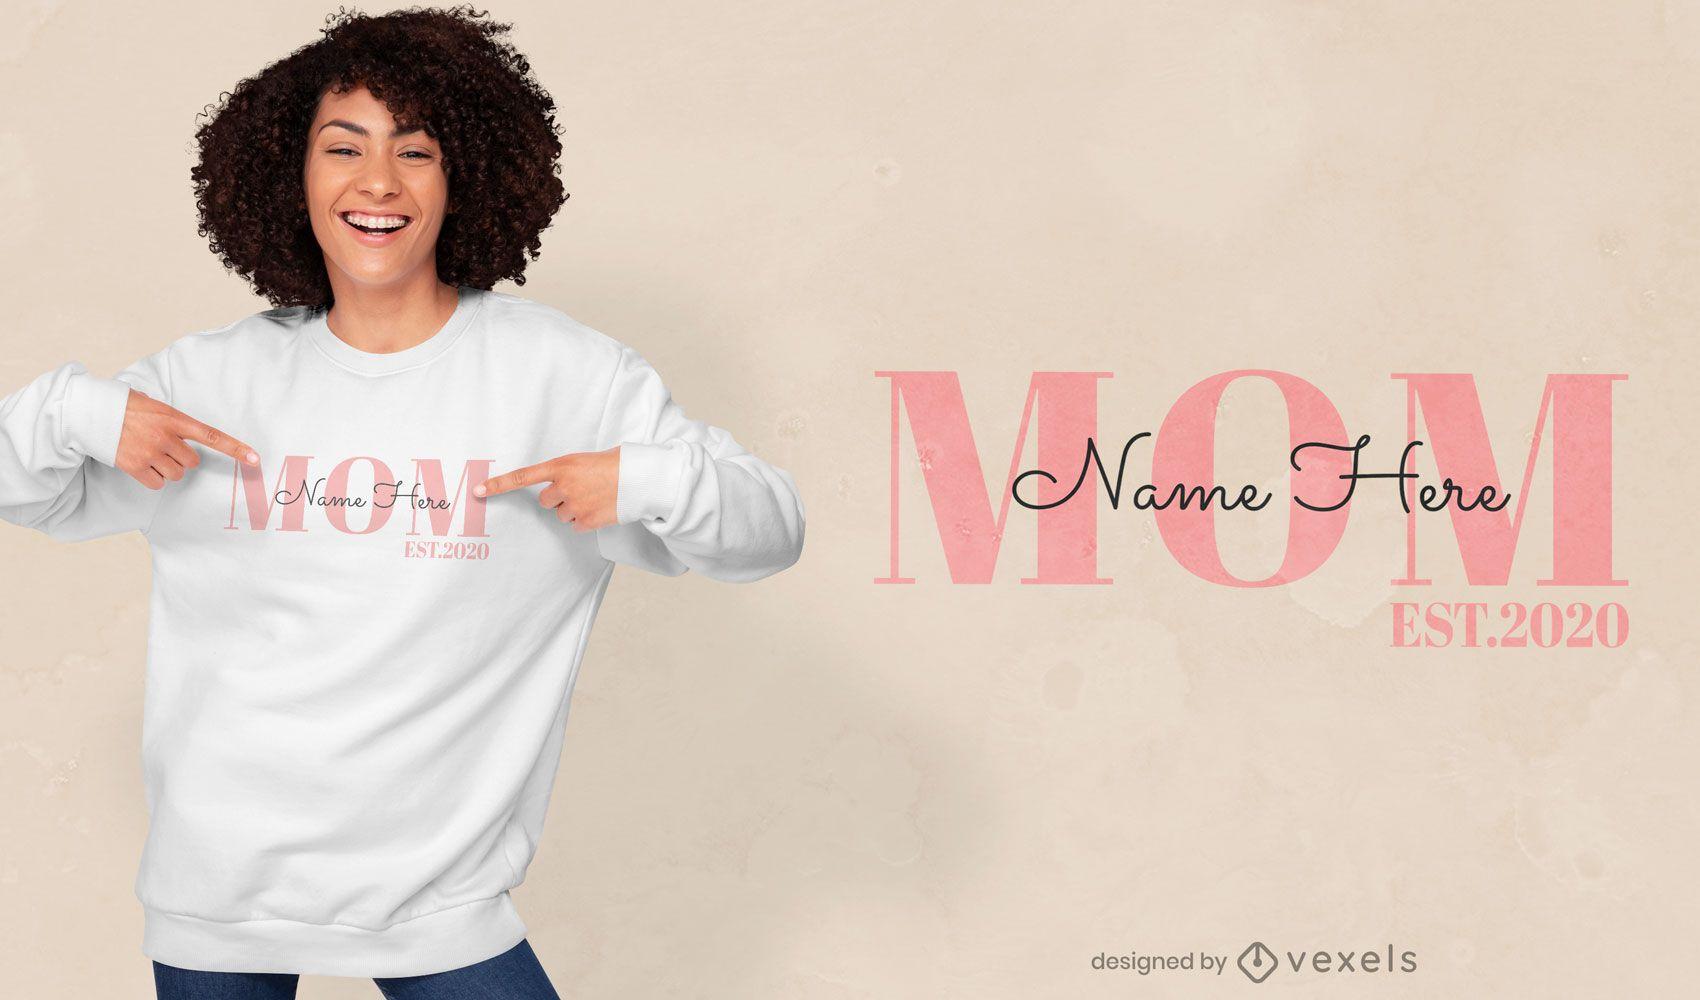 Dise?o de camiseta de cita editable de mam?